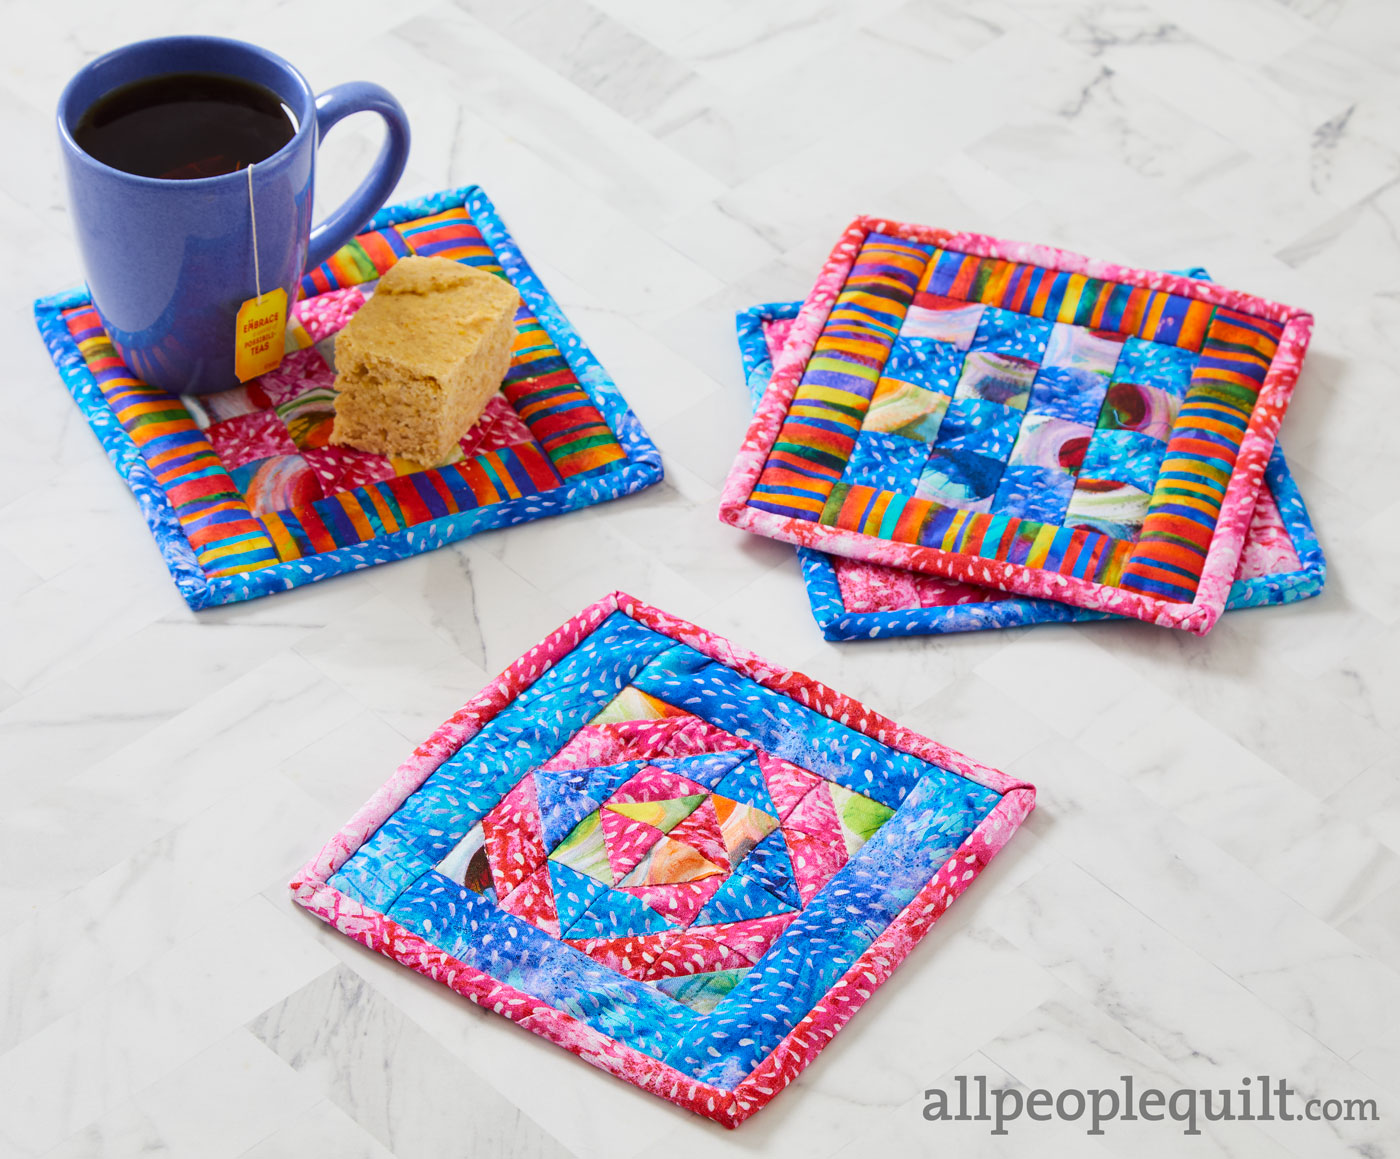 colorful mug rugs